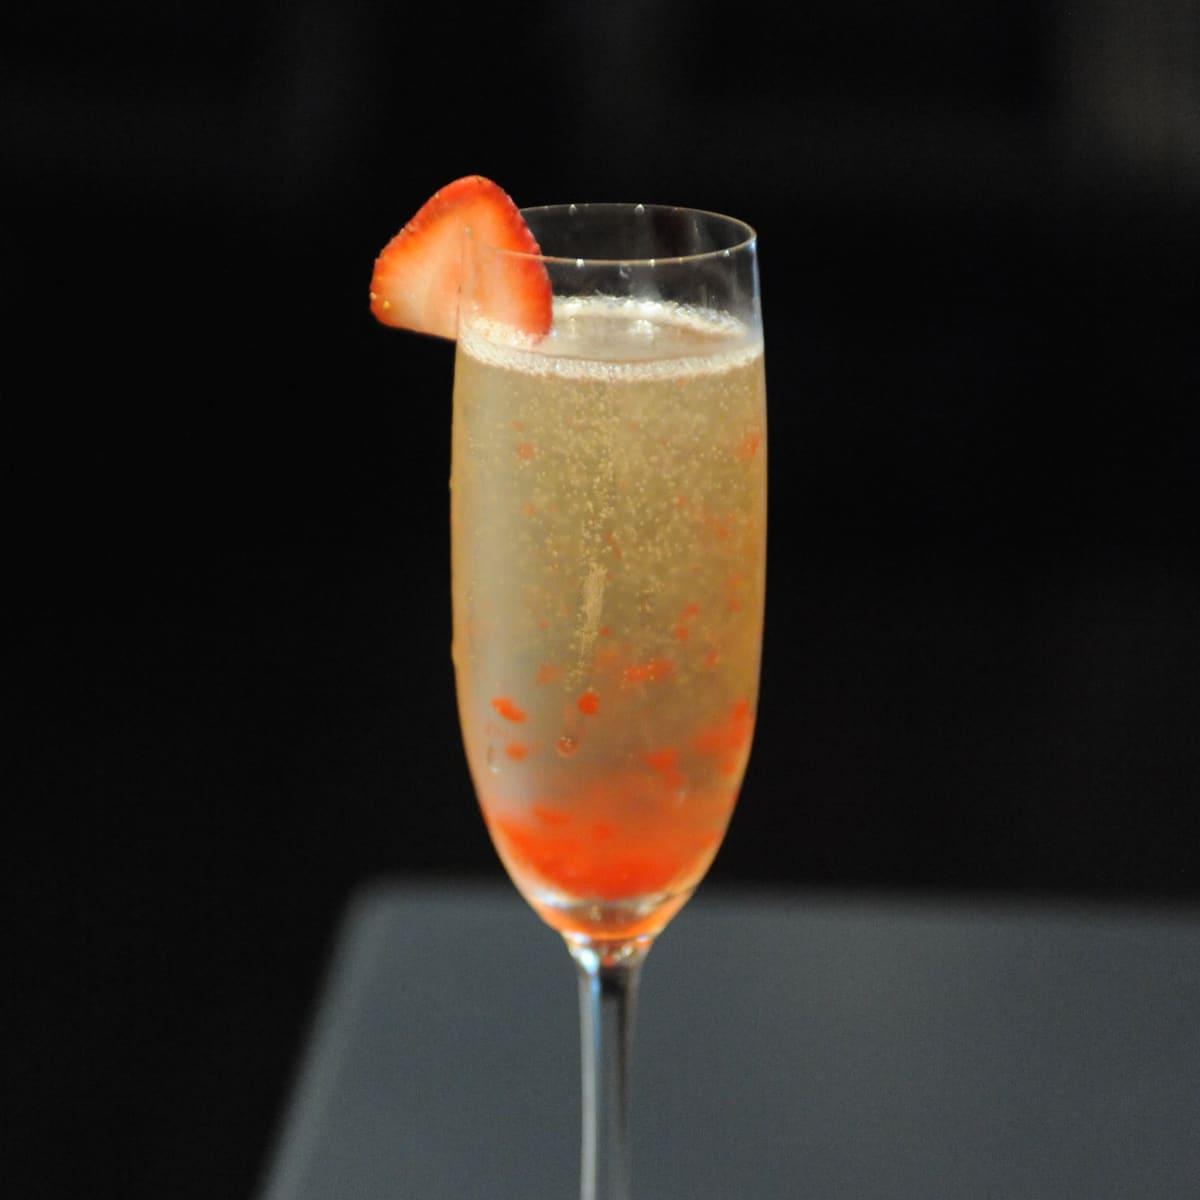 Tarakaan champagne cocktail